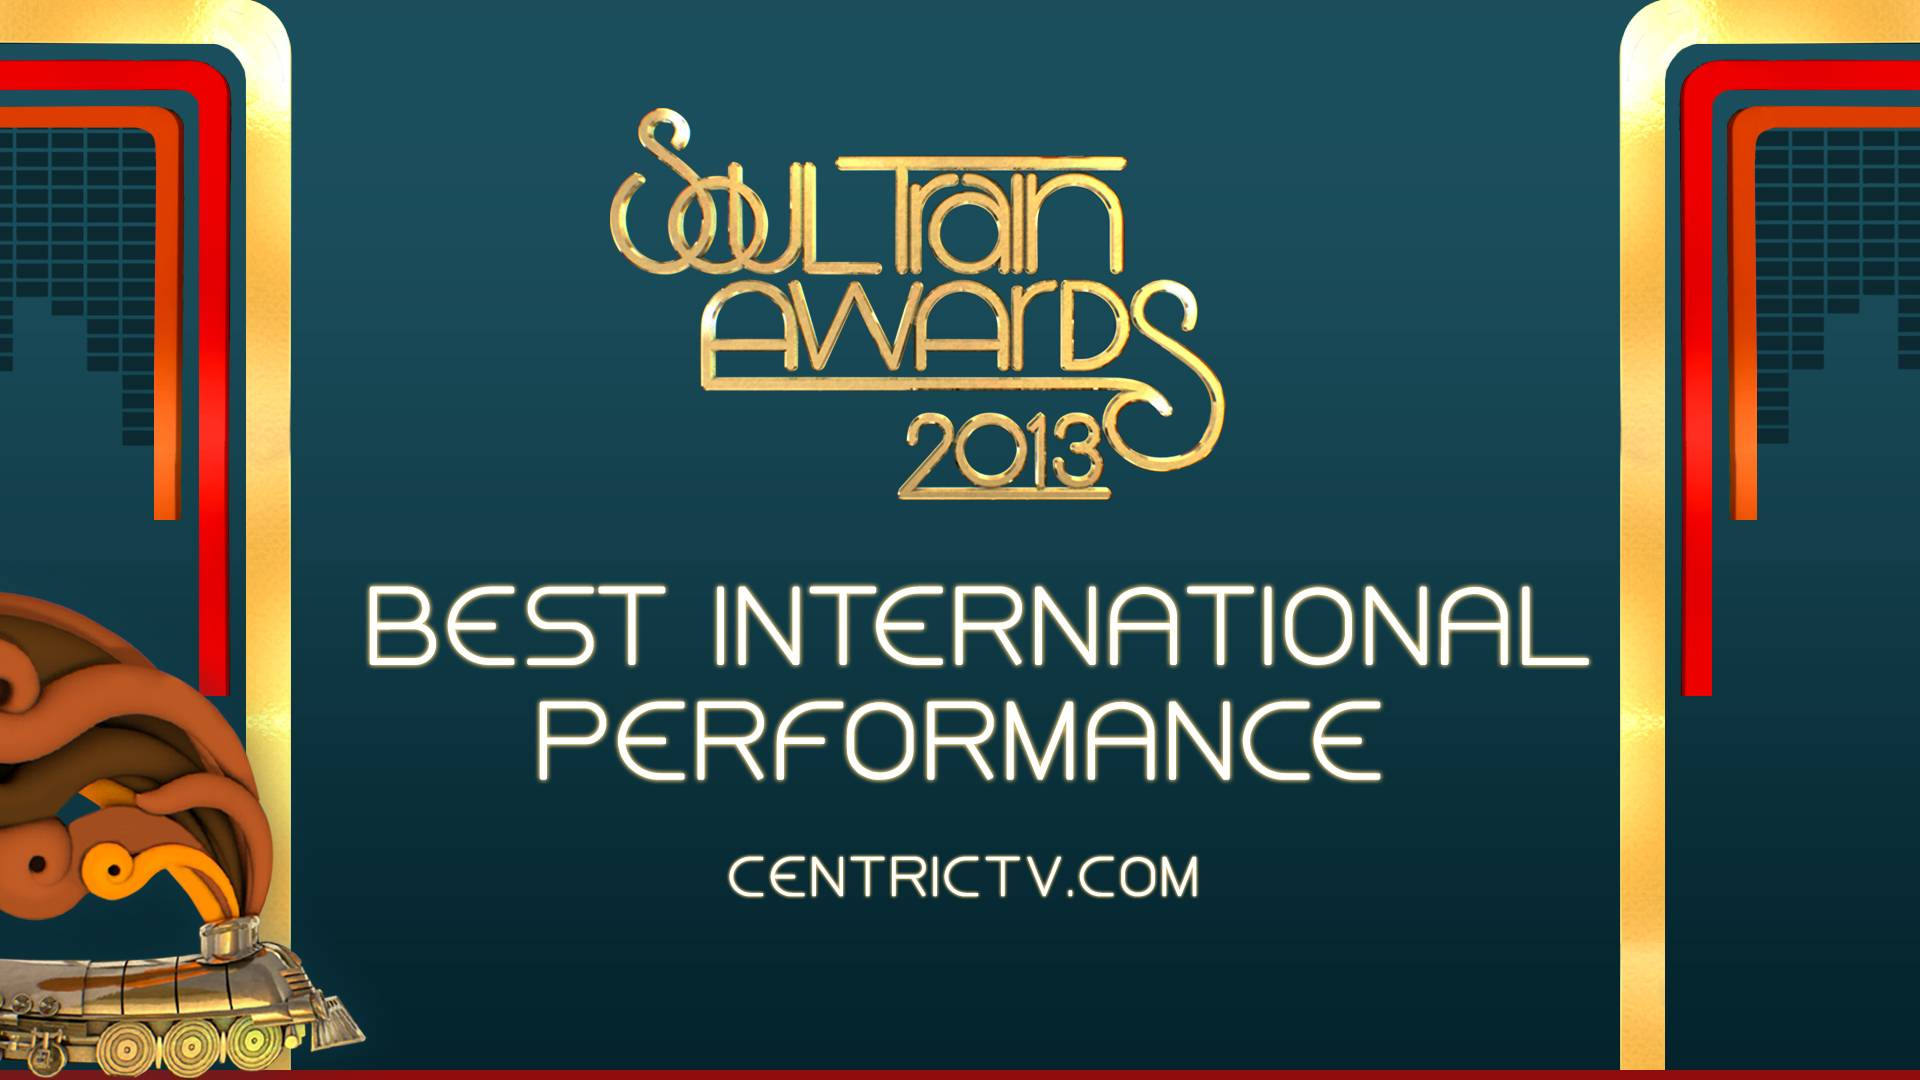 Best International Performance